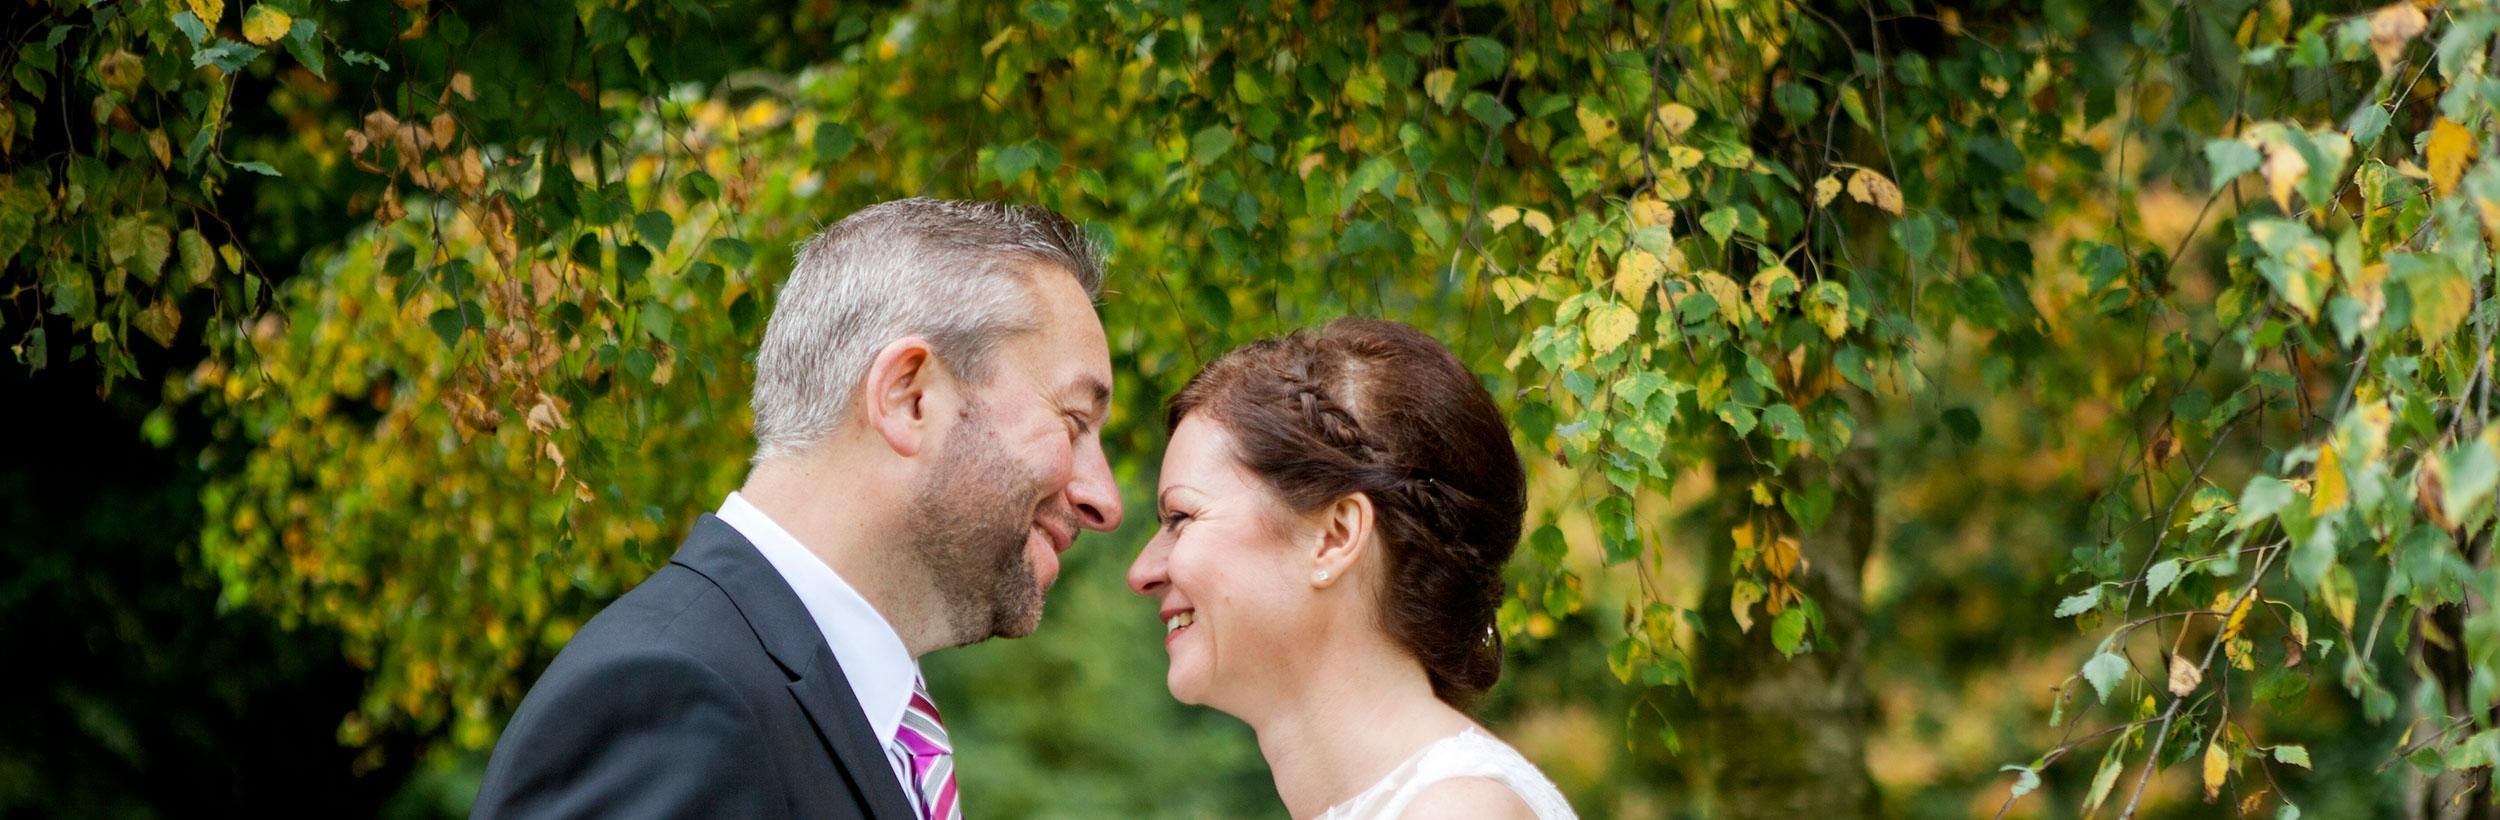 mariage-isabelle-emmanuel-pagetop